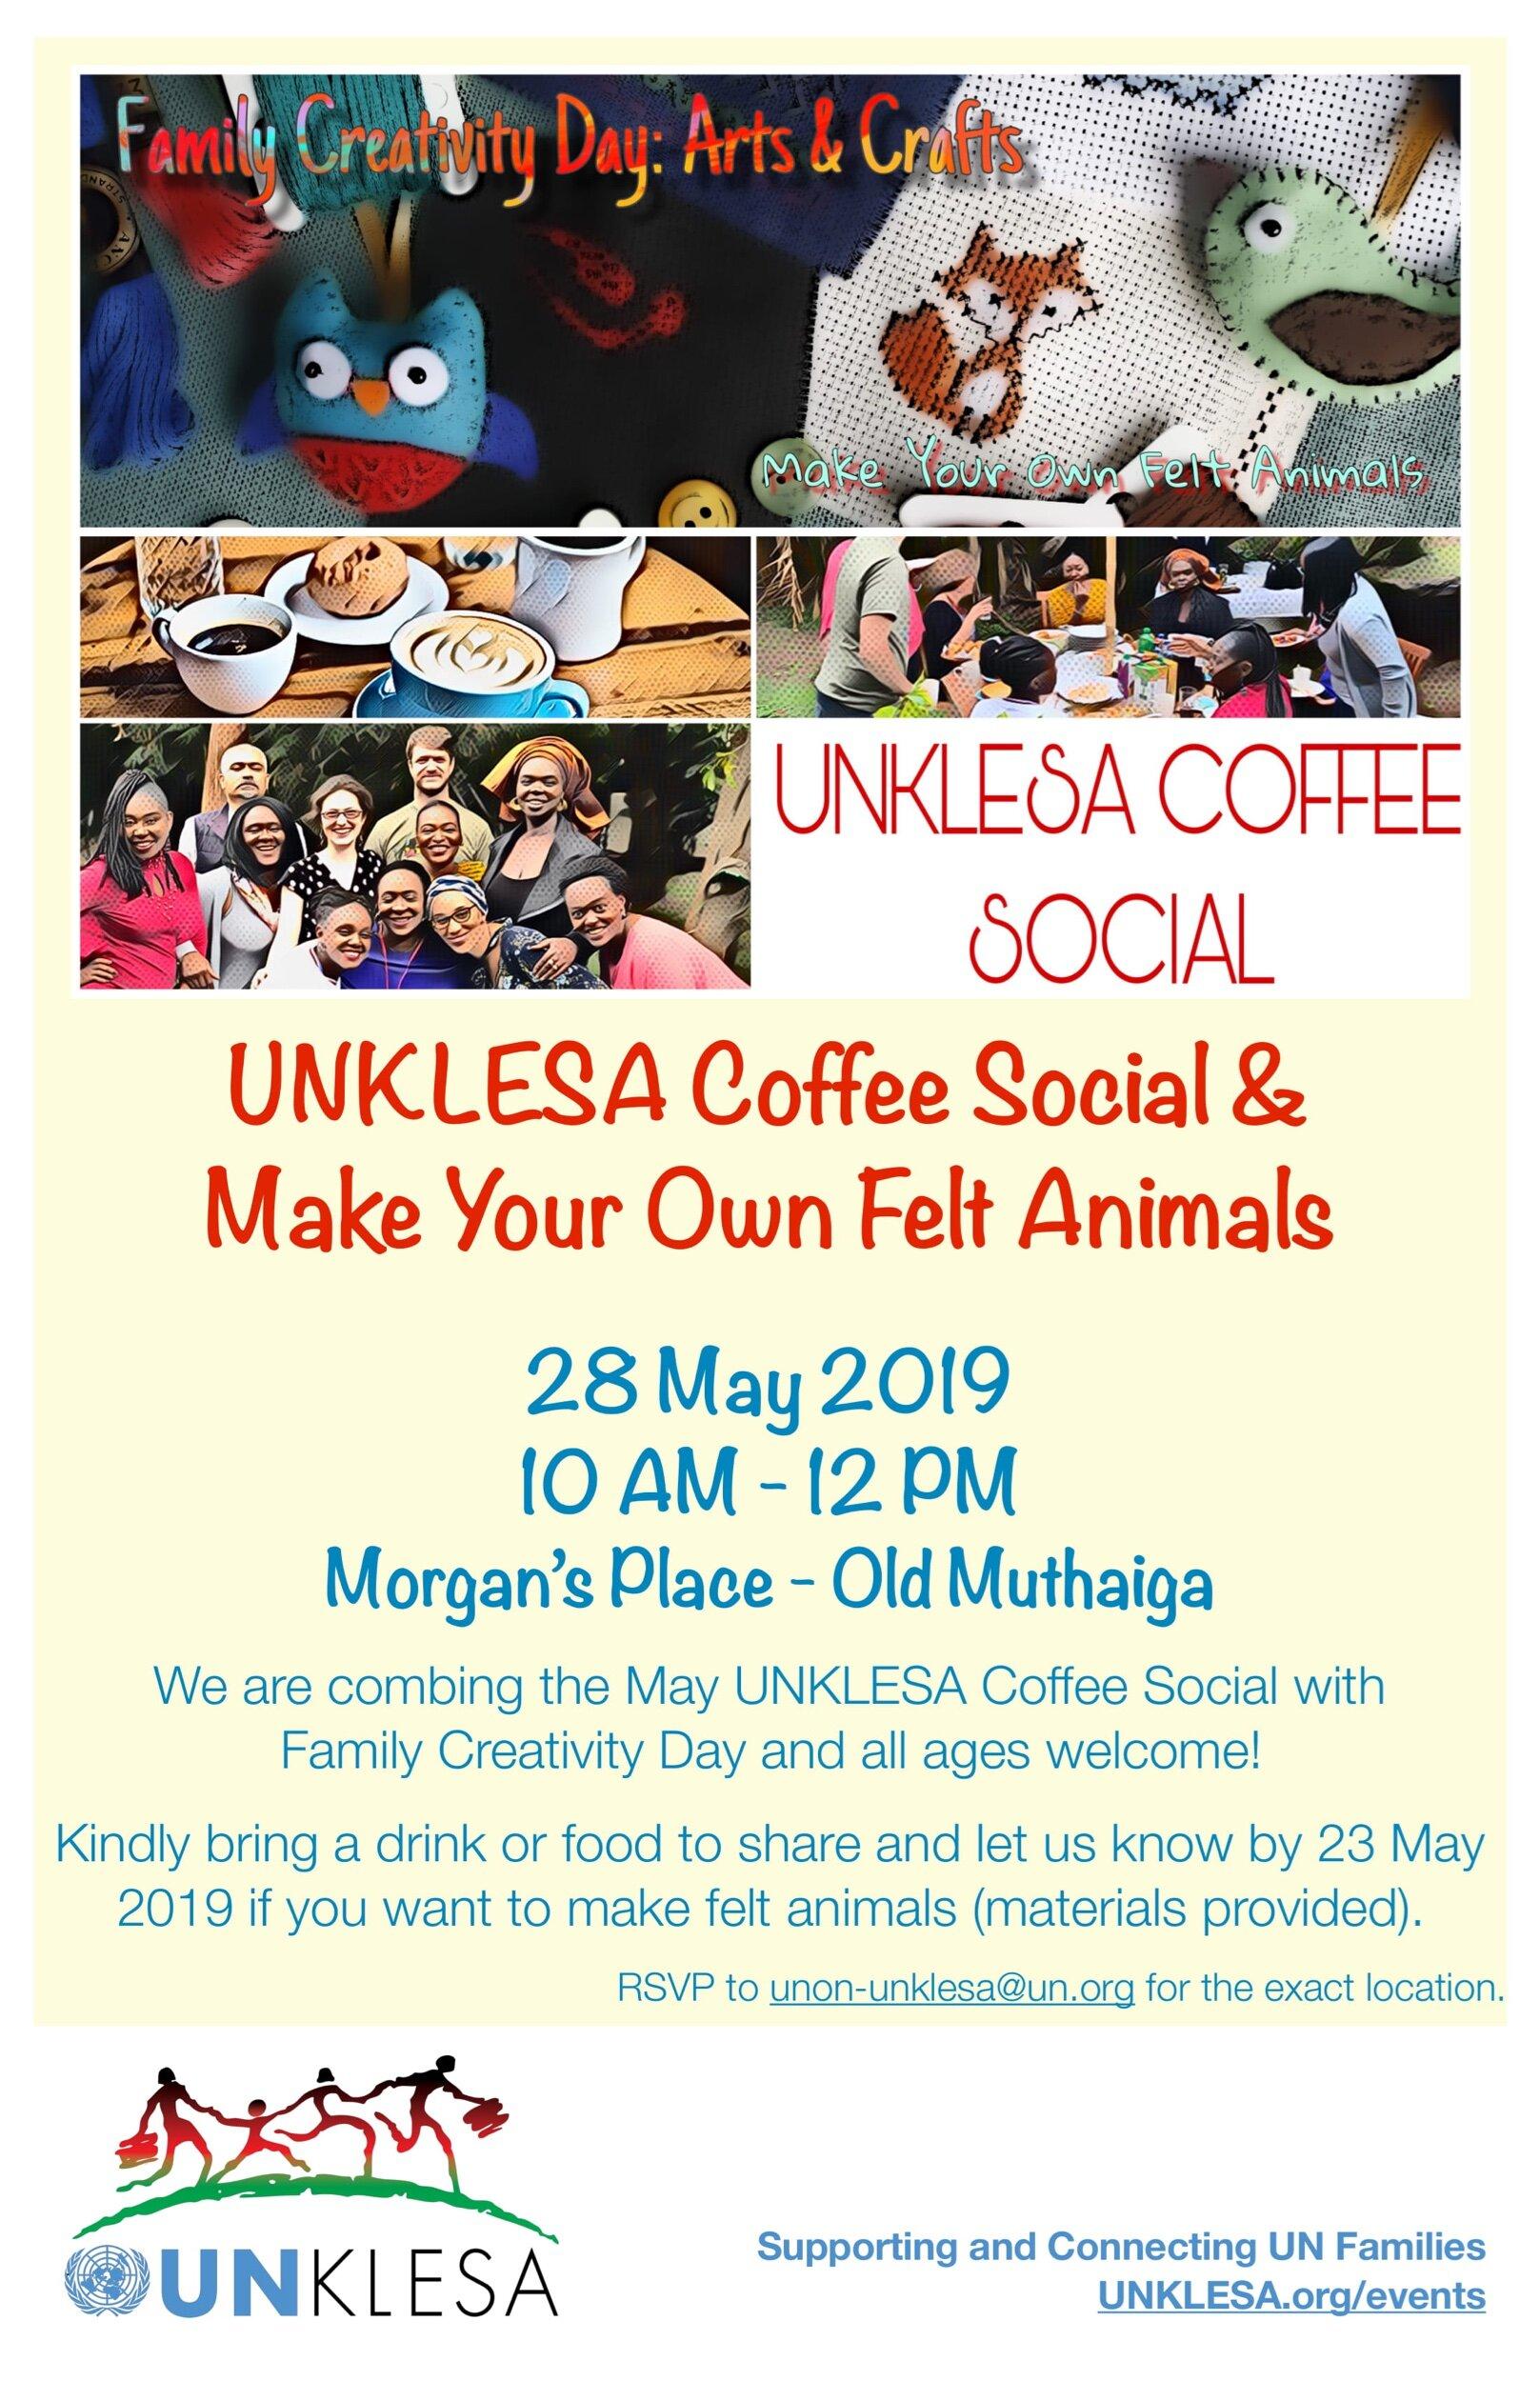 UNKLESA_CoffeeSocial&CraftsDay_2019_May28-1.jpeg